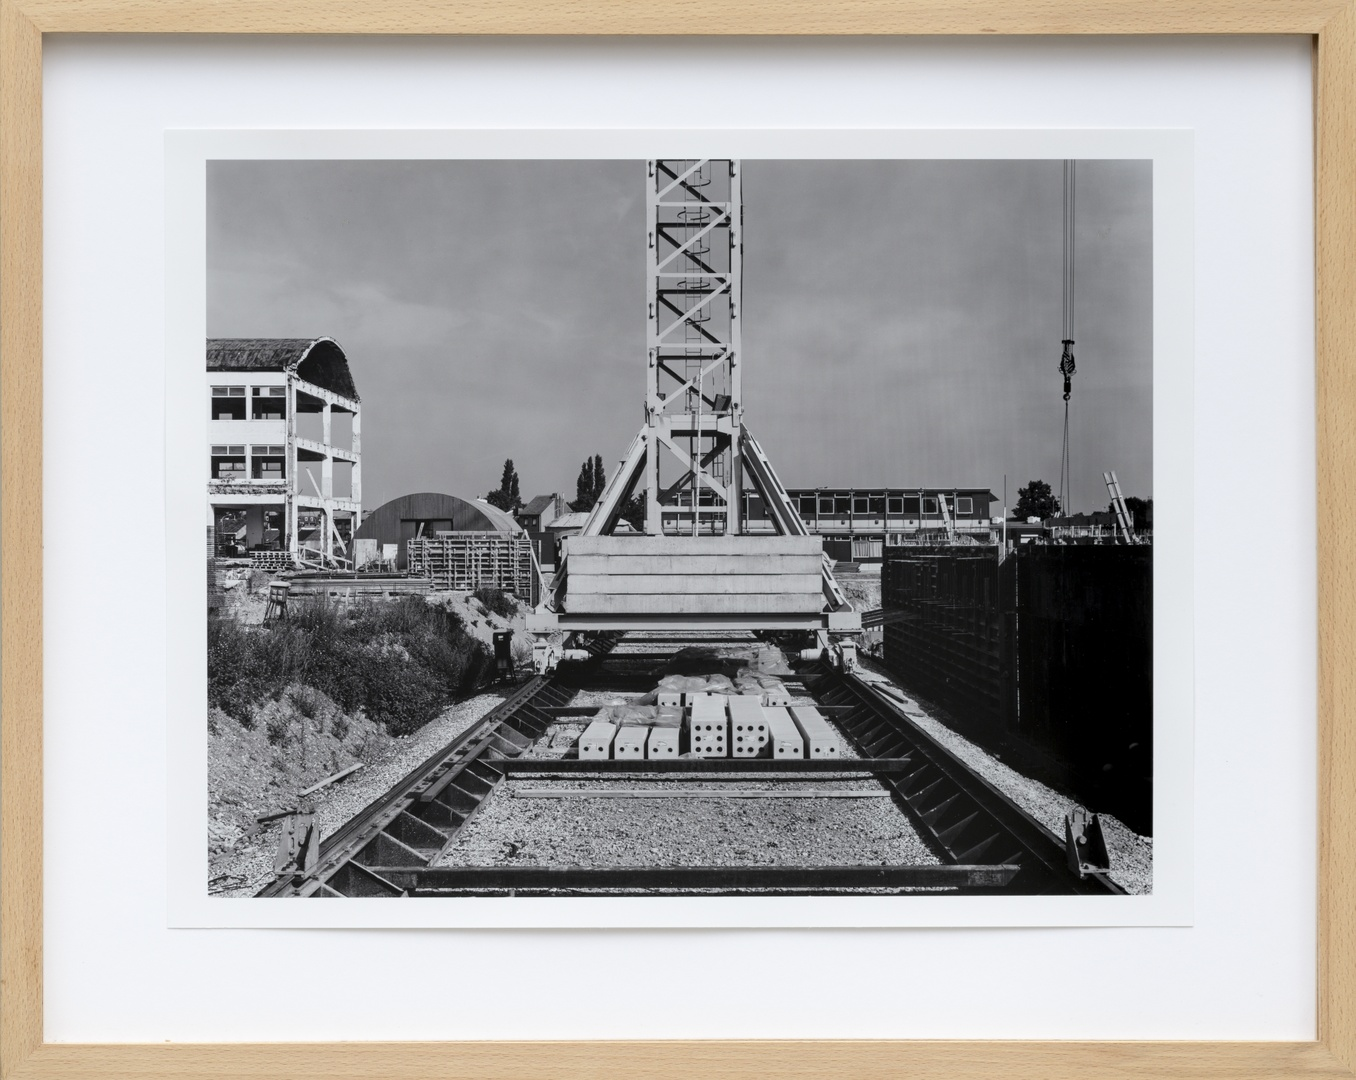 Bouw Bonnefantenmuseum 1992-1994 ; Noodtrappenhuis voorgevel